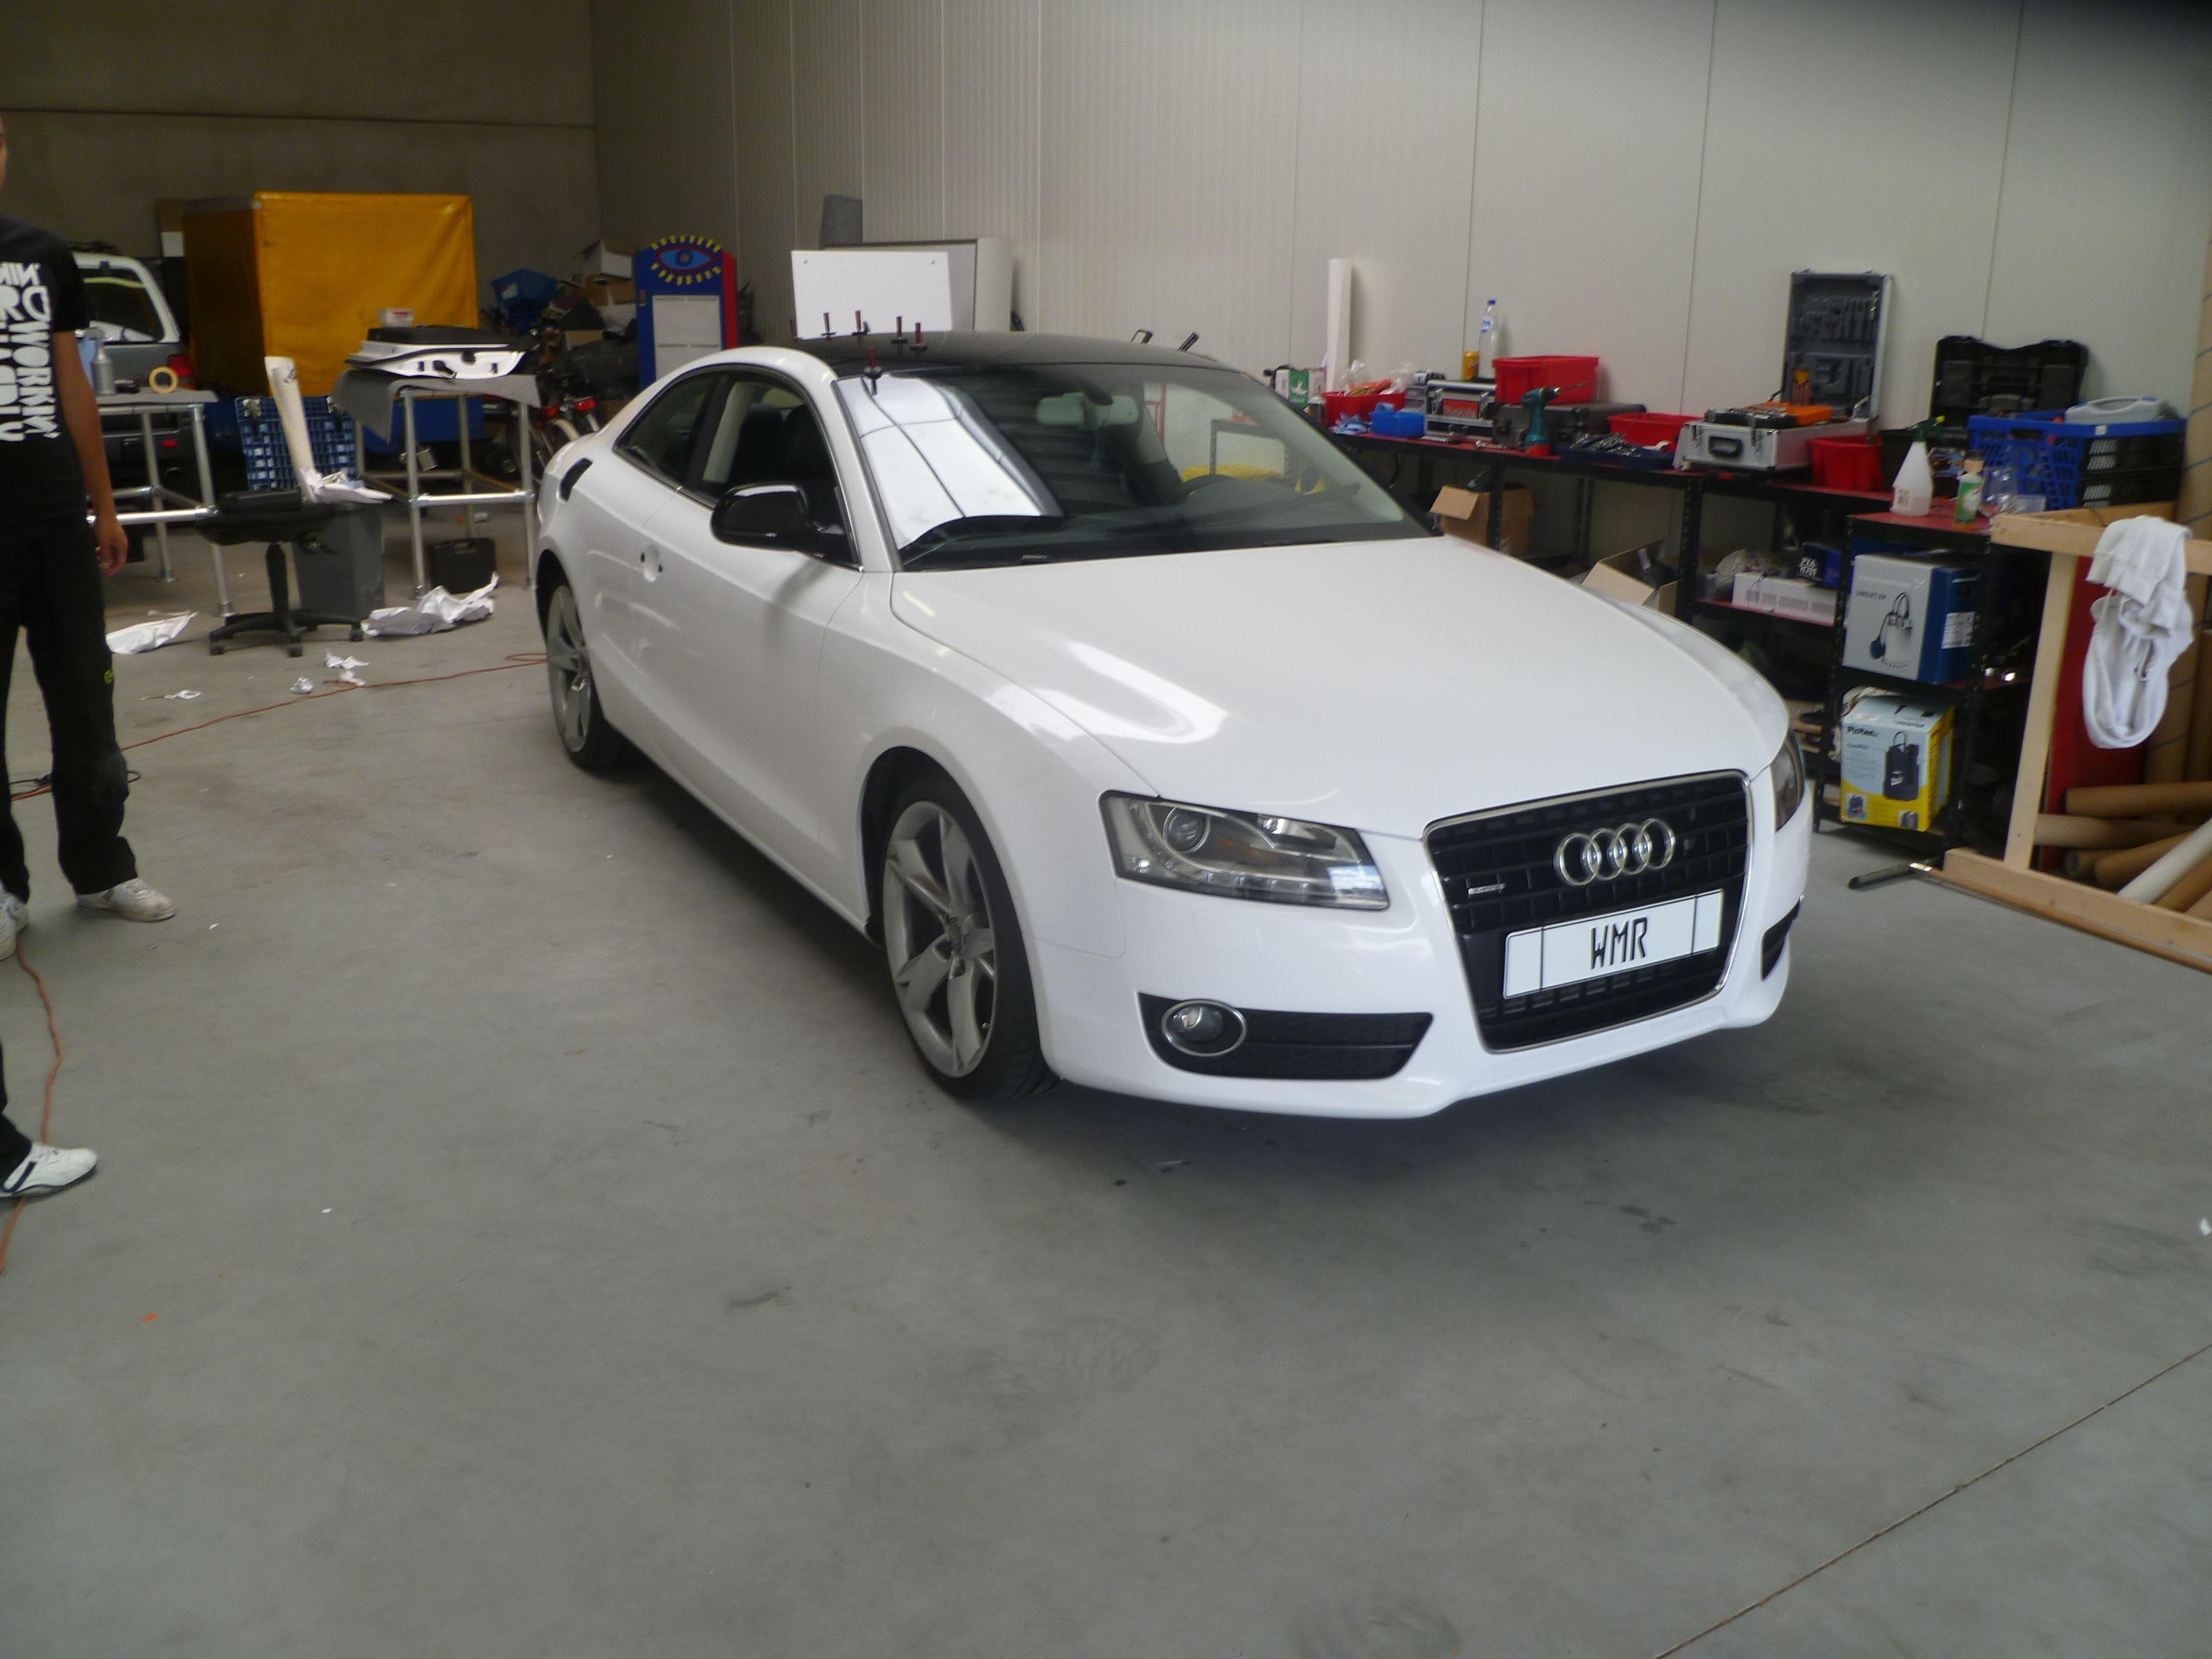 Audi A5 coupe met Metallic Witte Wrap, Carwrapping door Wrapmyride.nu Foto-nr:4724, ©2021